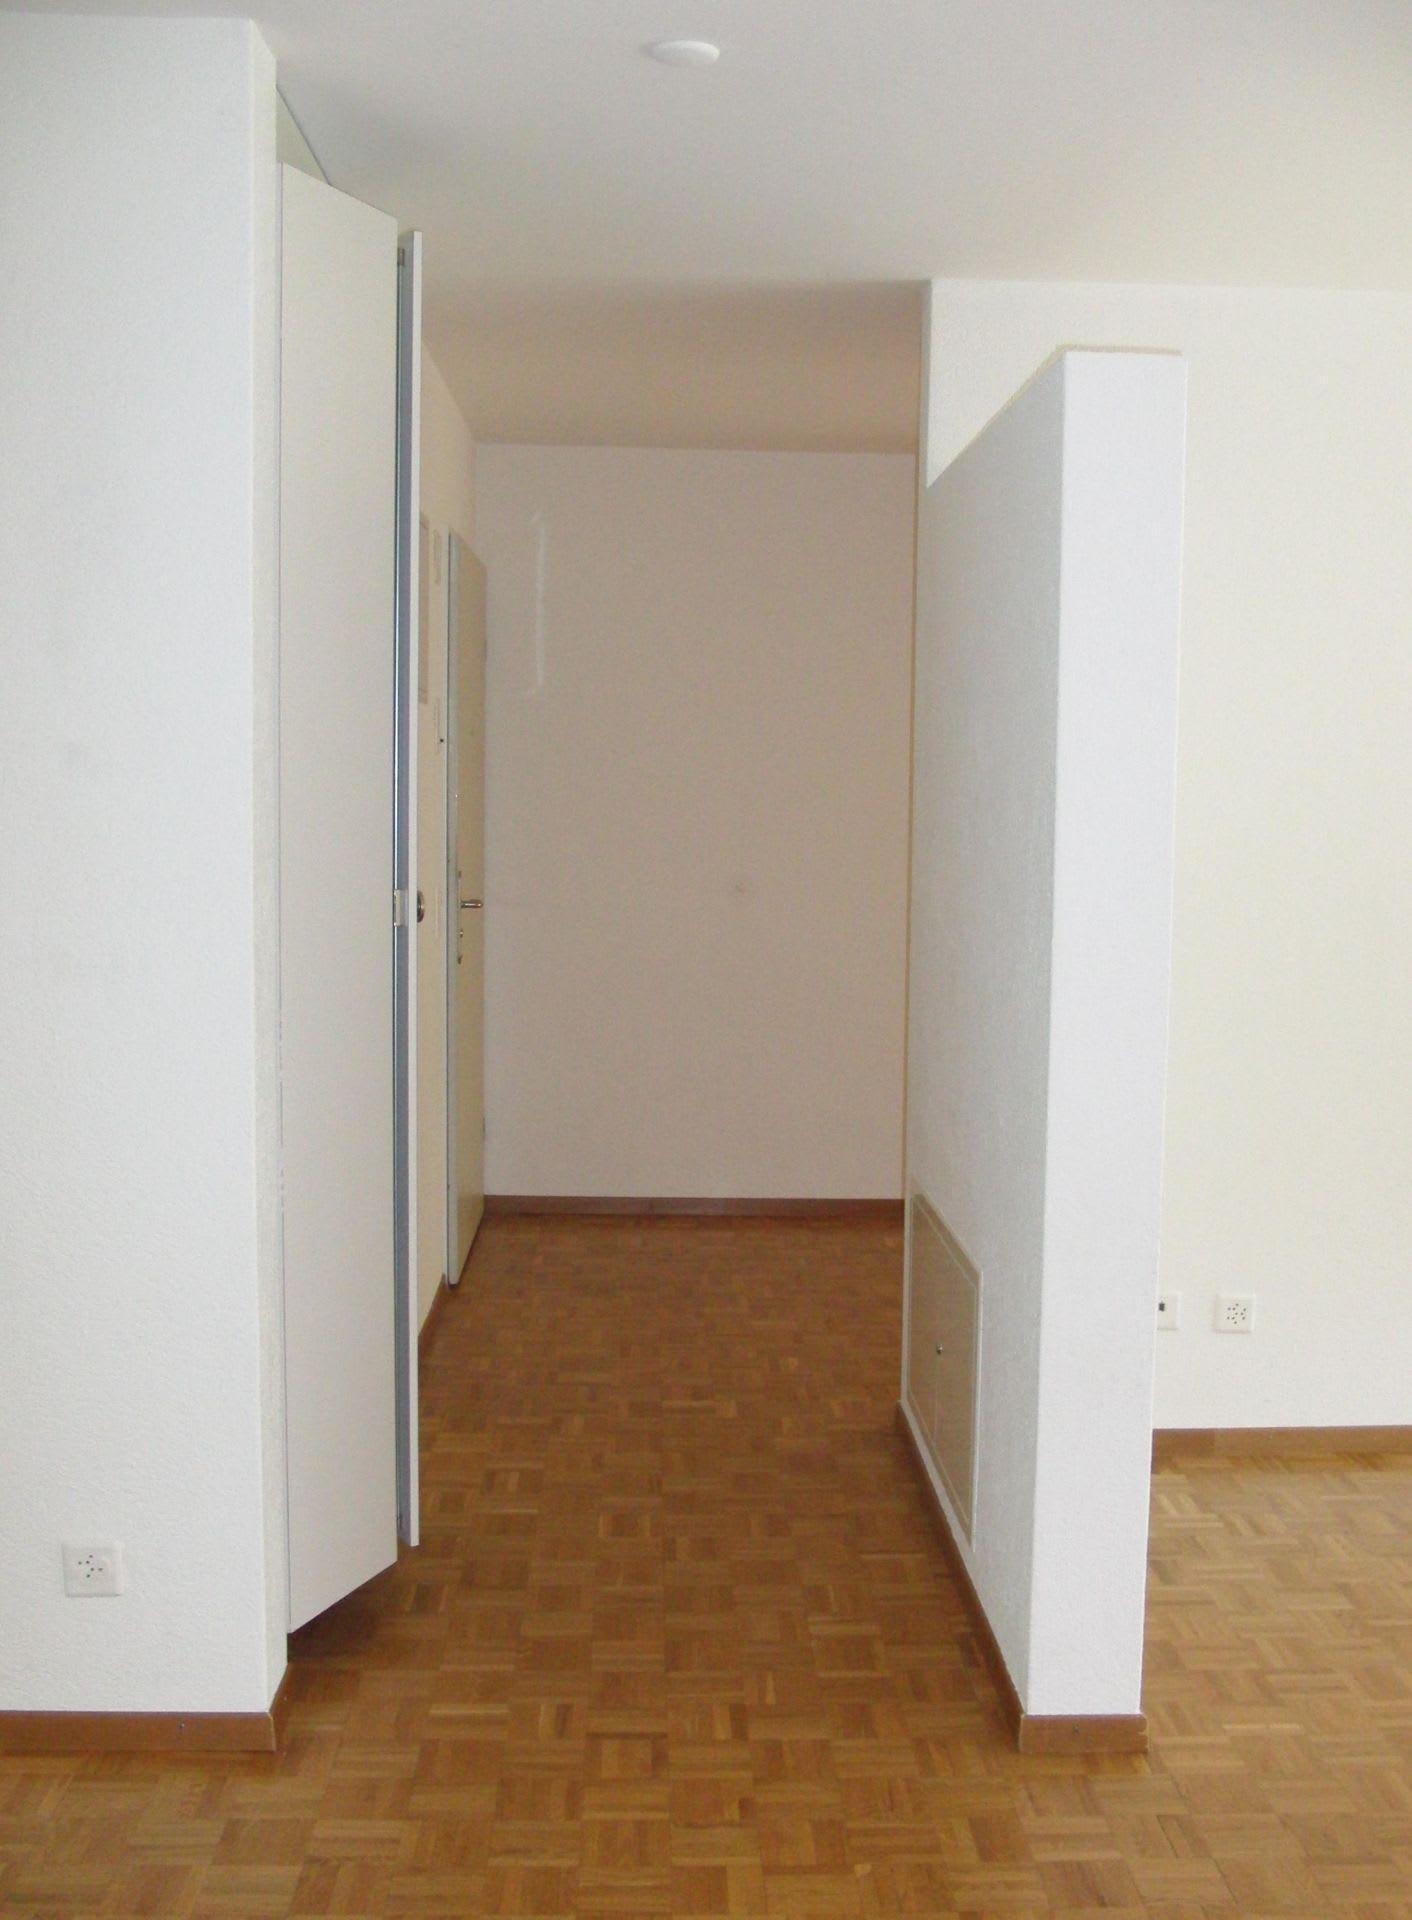 Grossackerstrasse 71